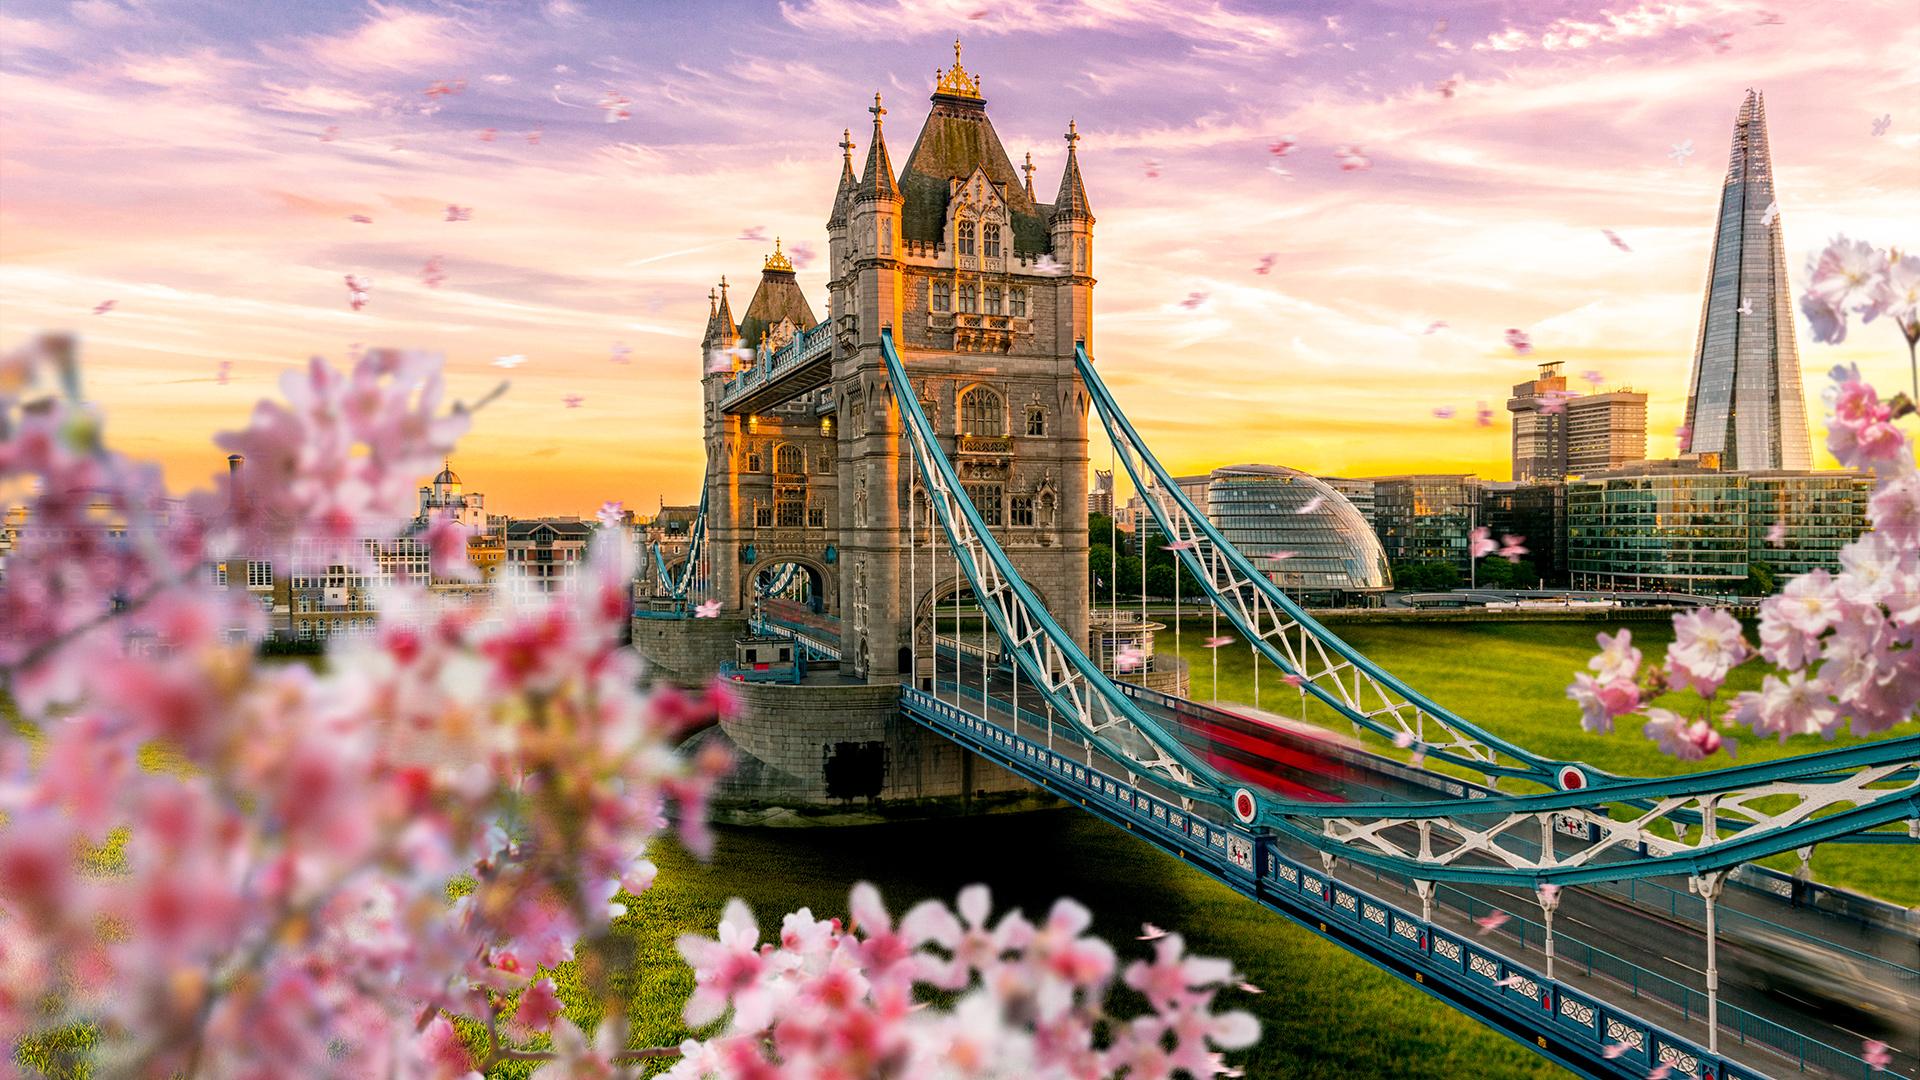 London Eye - England - World for Travel